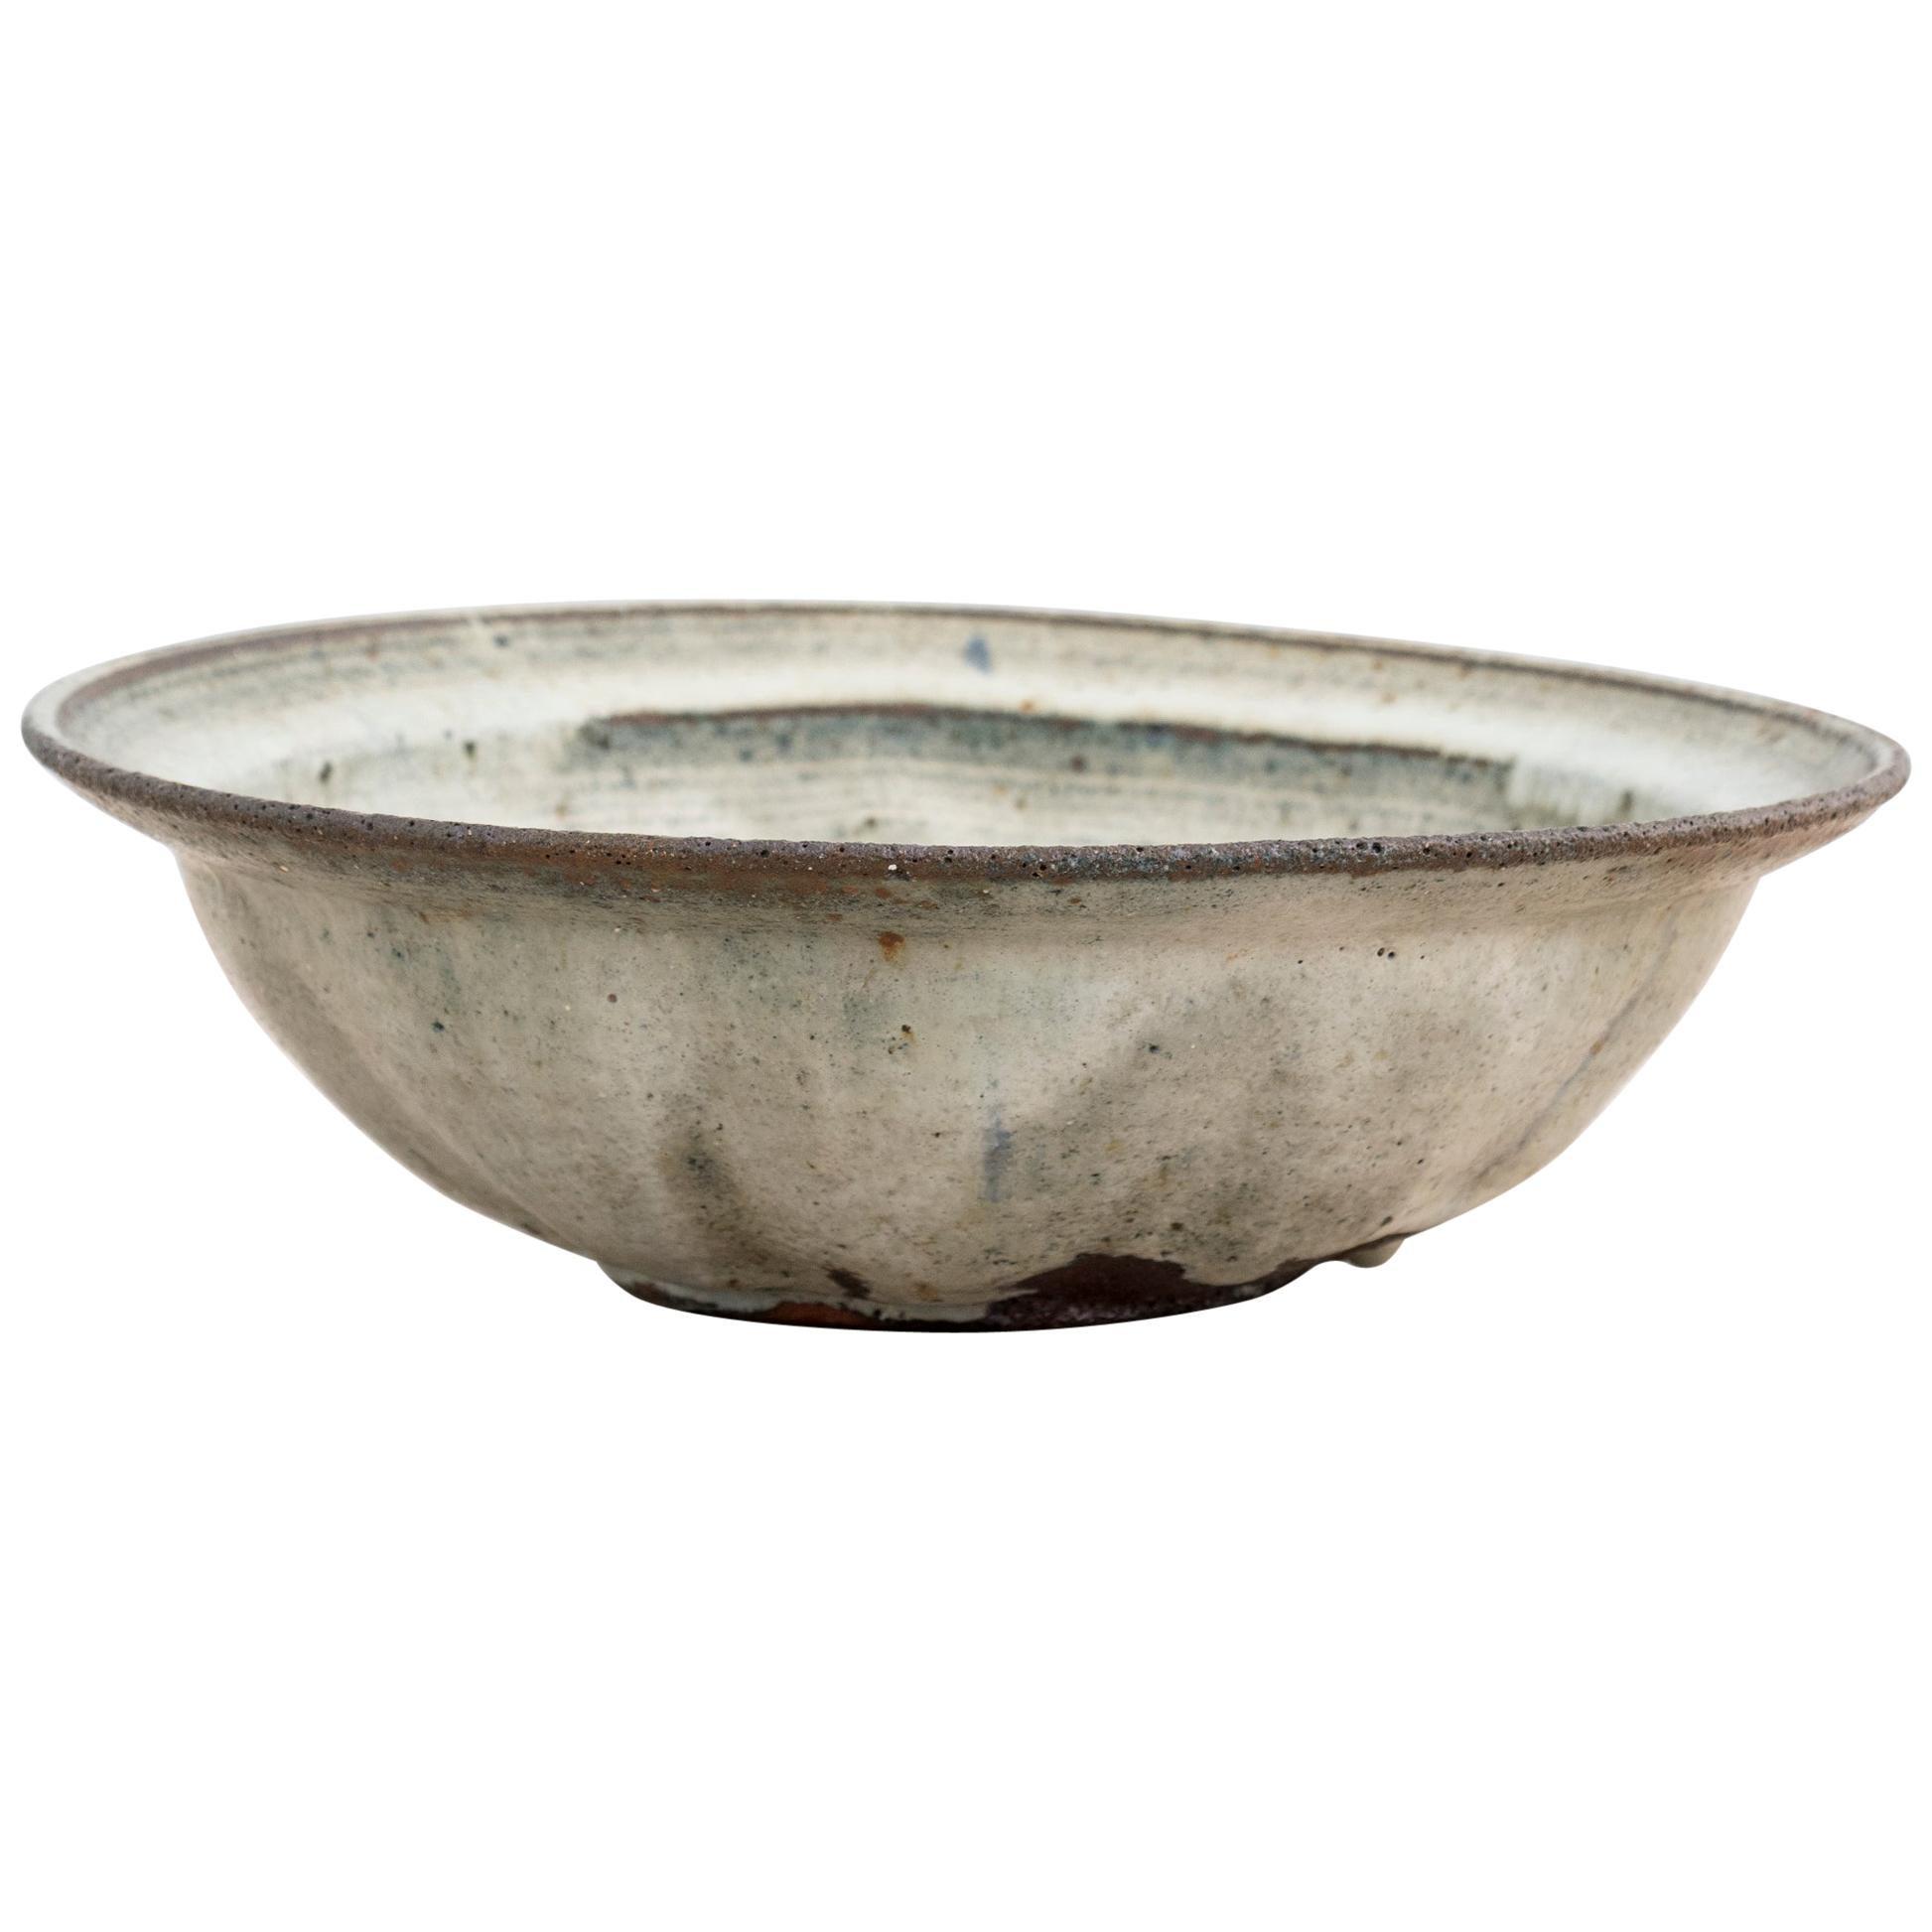 Light Grey and Blue Stoneware Bowl by Gutte Eriksen